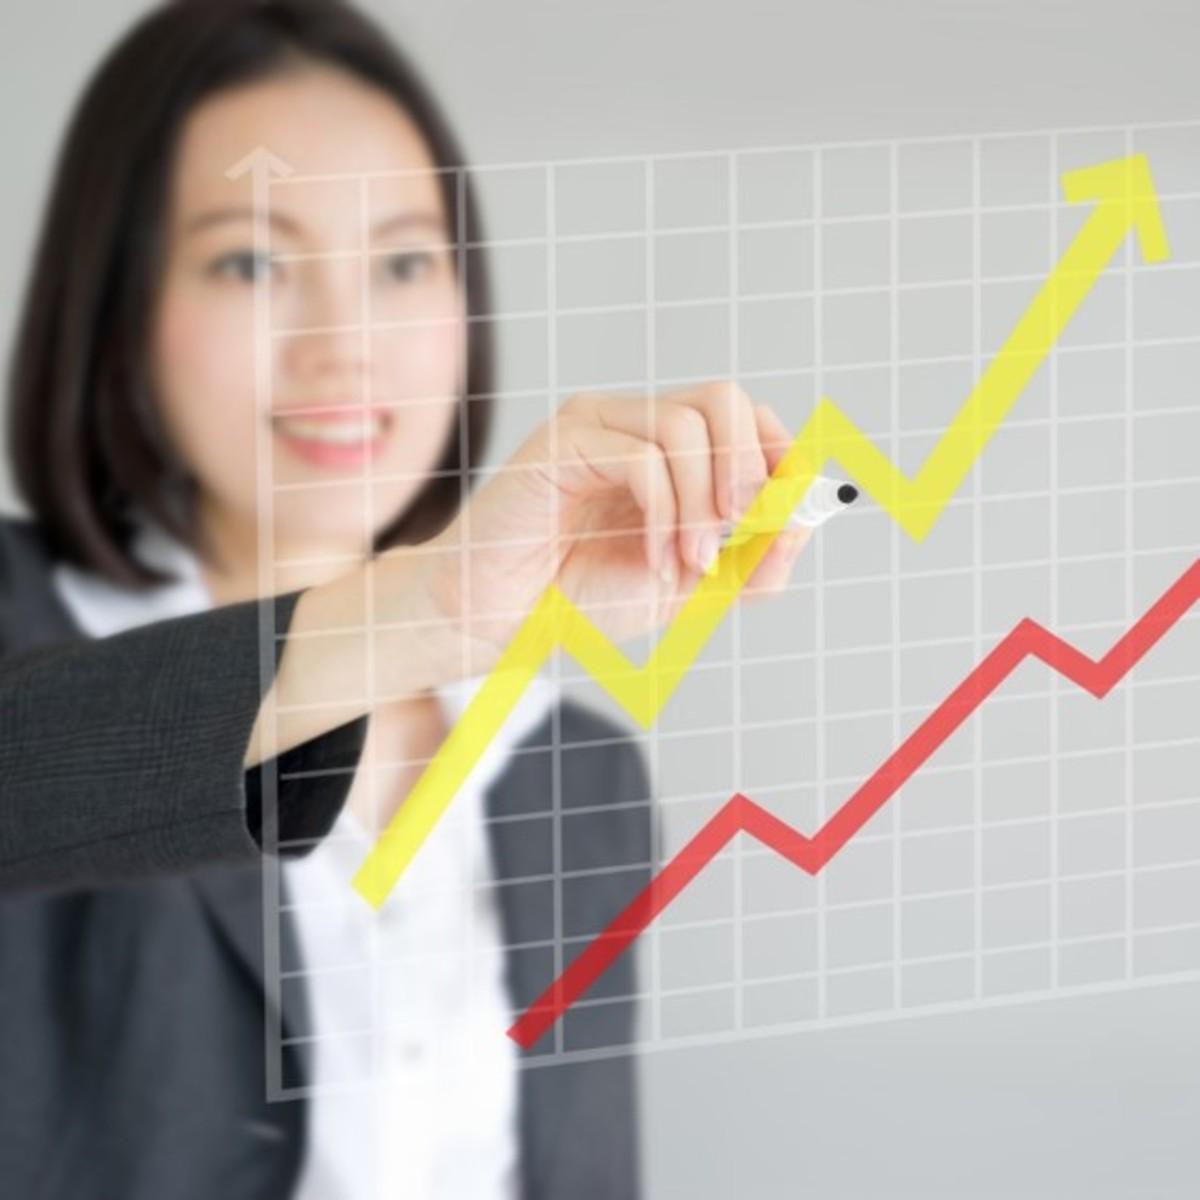 商务英语课程:财经英语 Finance & Economics course image